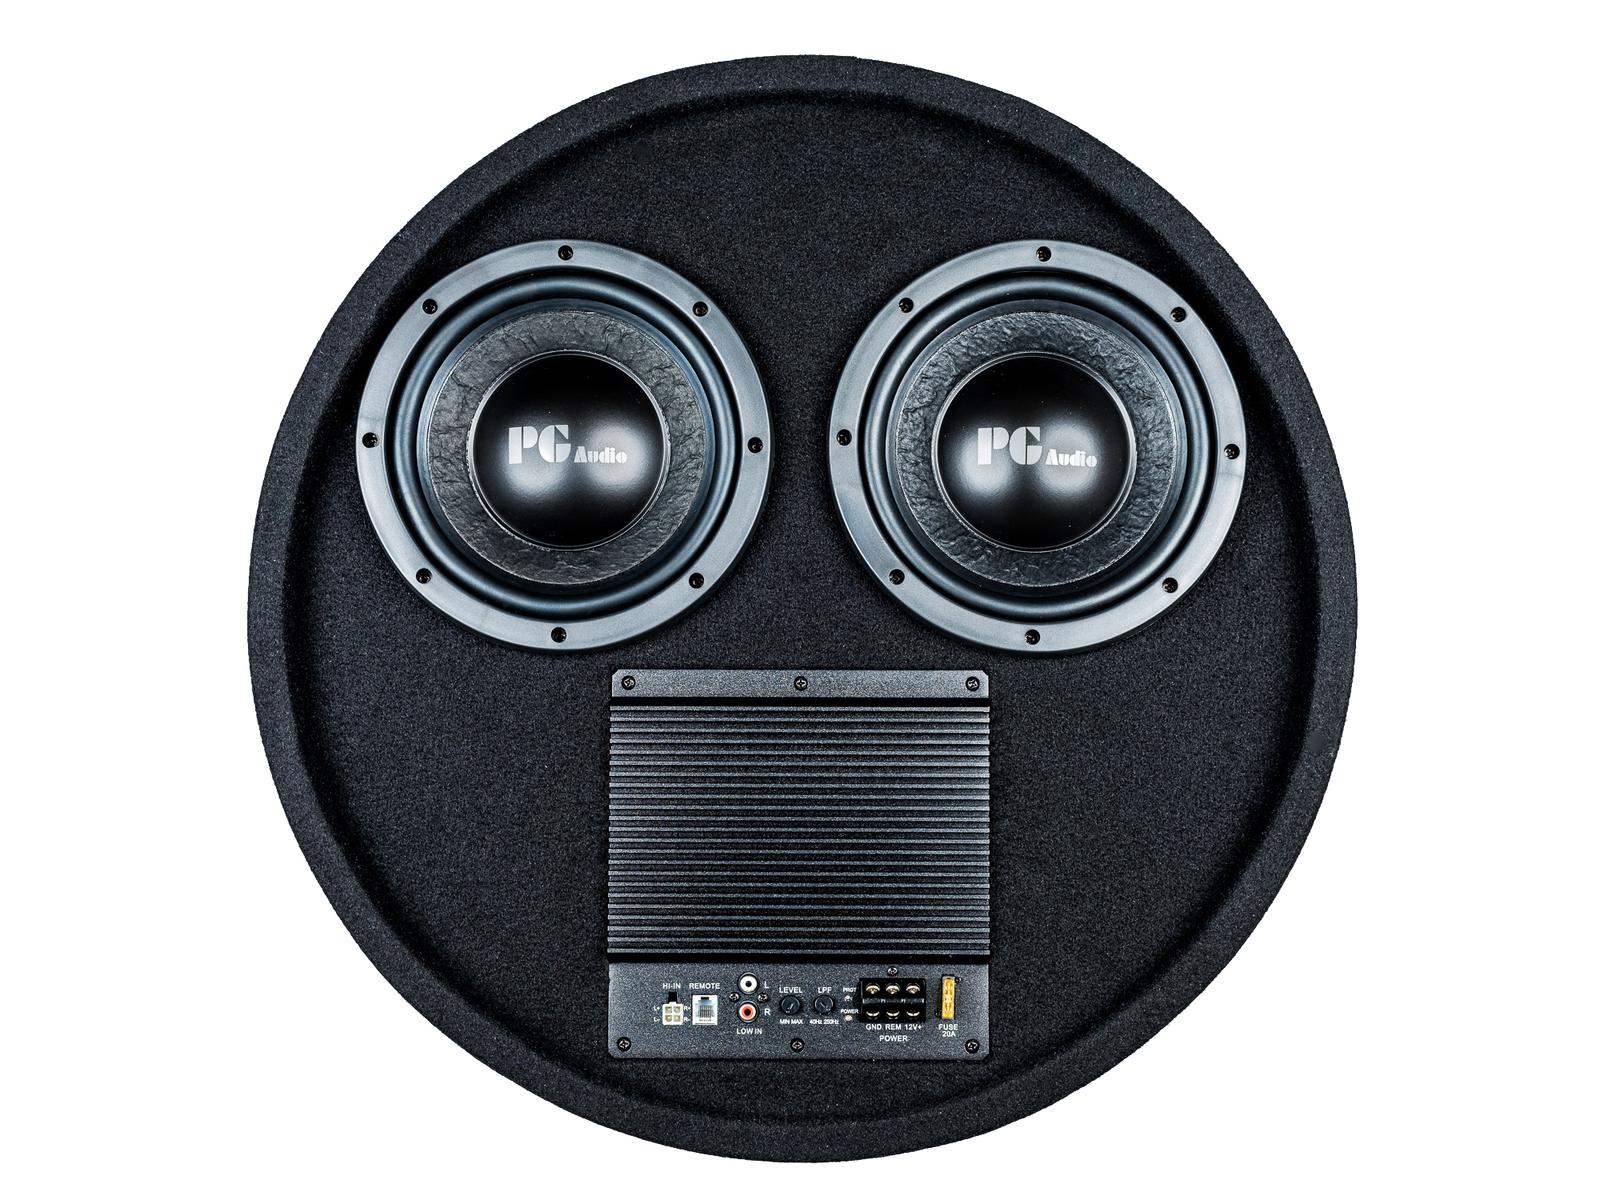 PG Audio aktiver Reserverad Subwoofer 2 x 8 Zoll ,1 Stück Neu – Bild 1